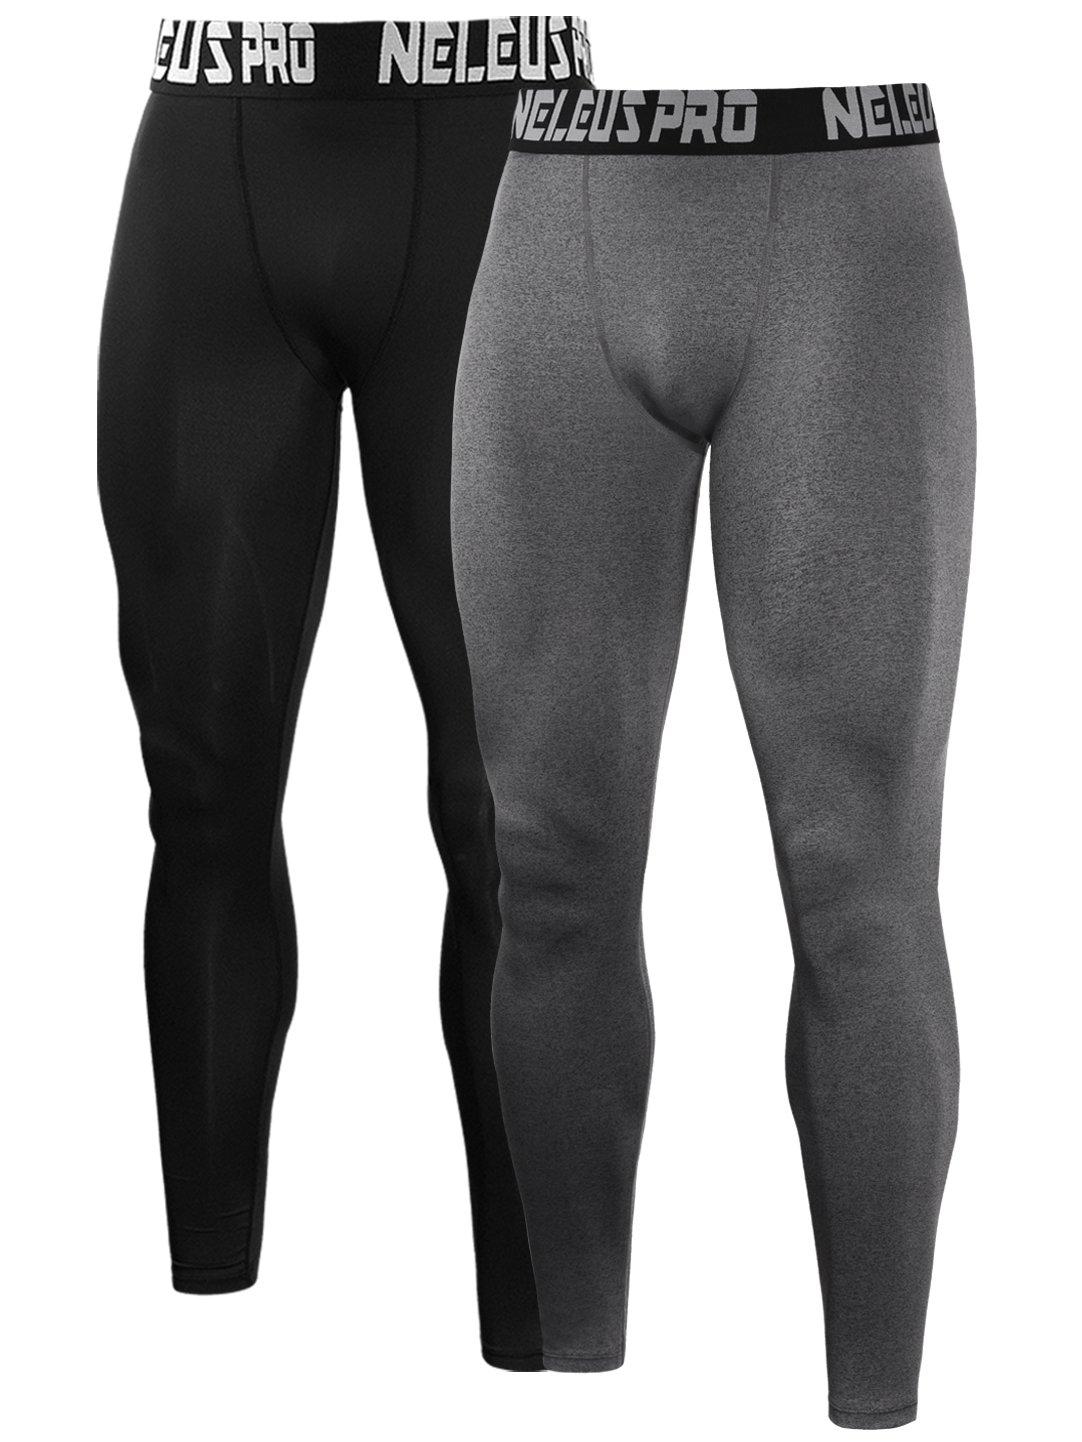 Neleus Men's 2 Pack Compression Tights Sport Running Leggings Pants,6019,Black,Grey,US S,EU M